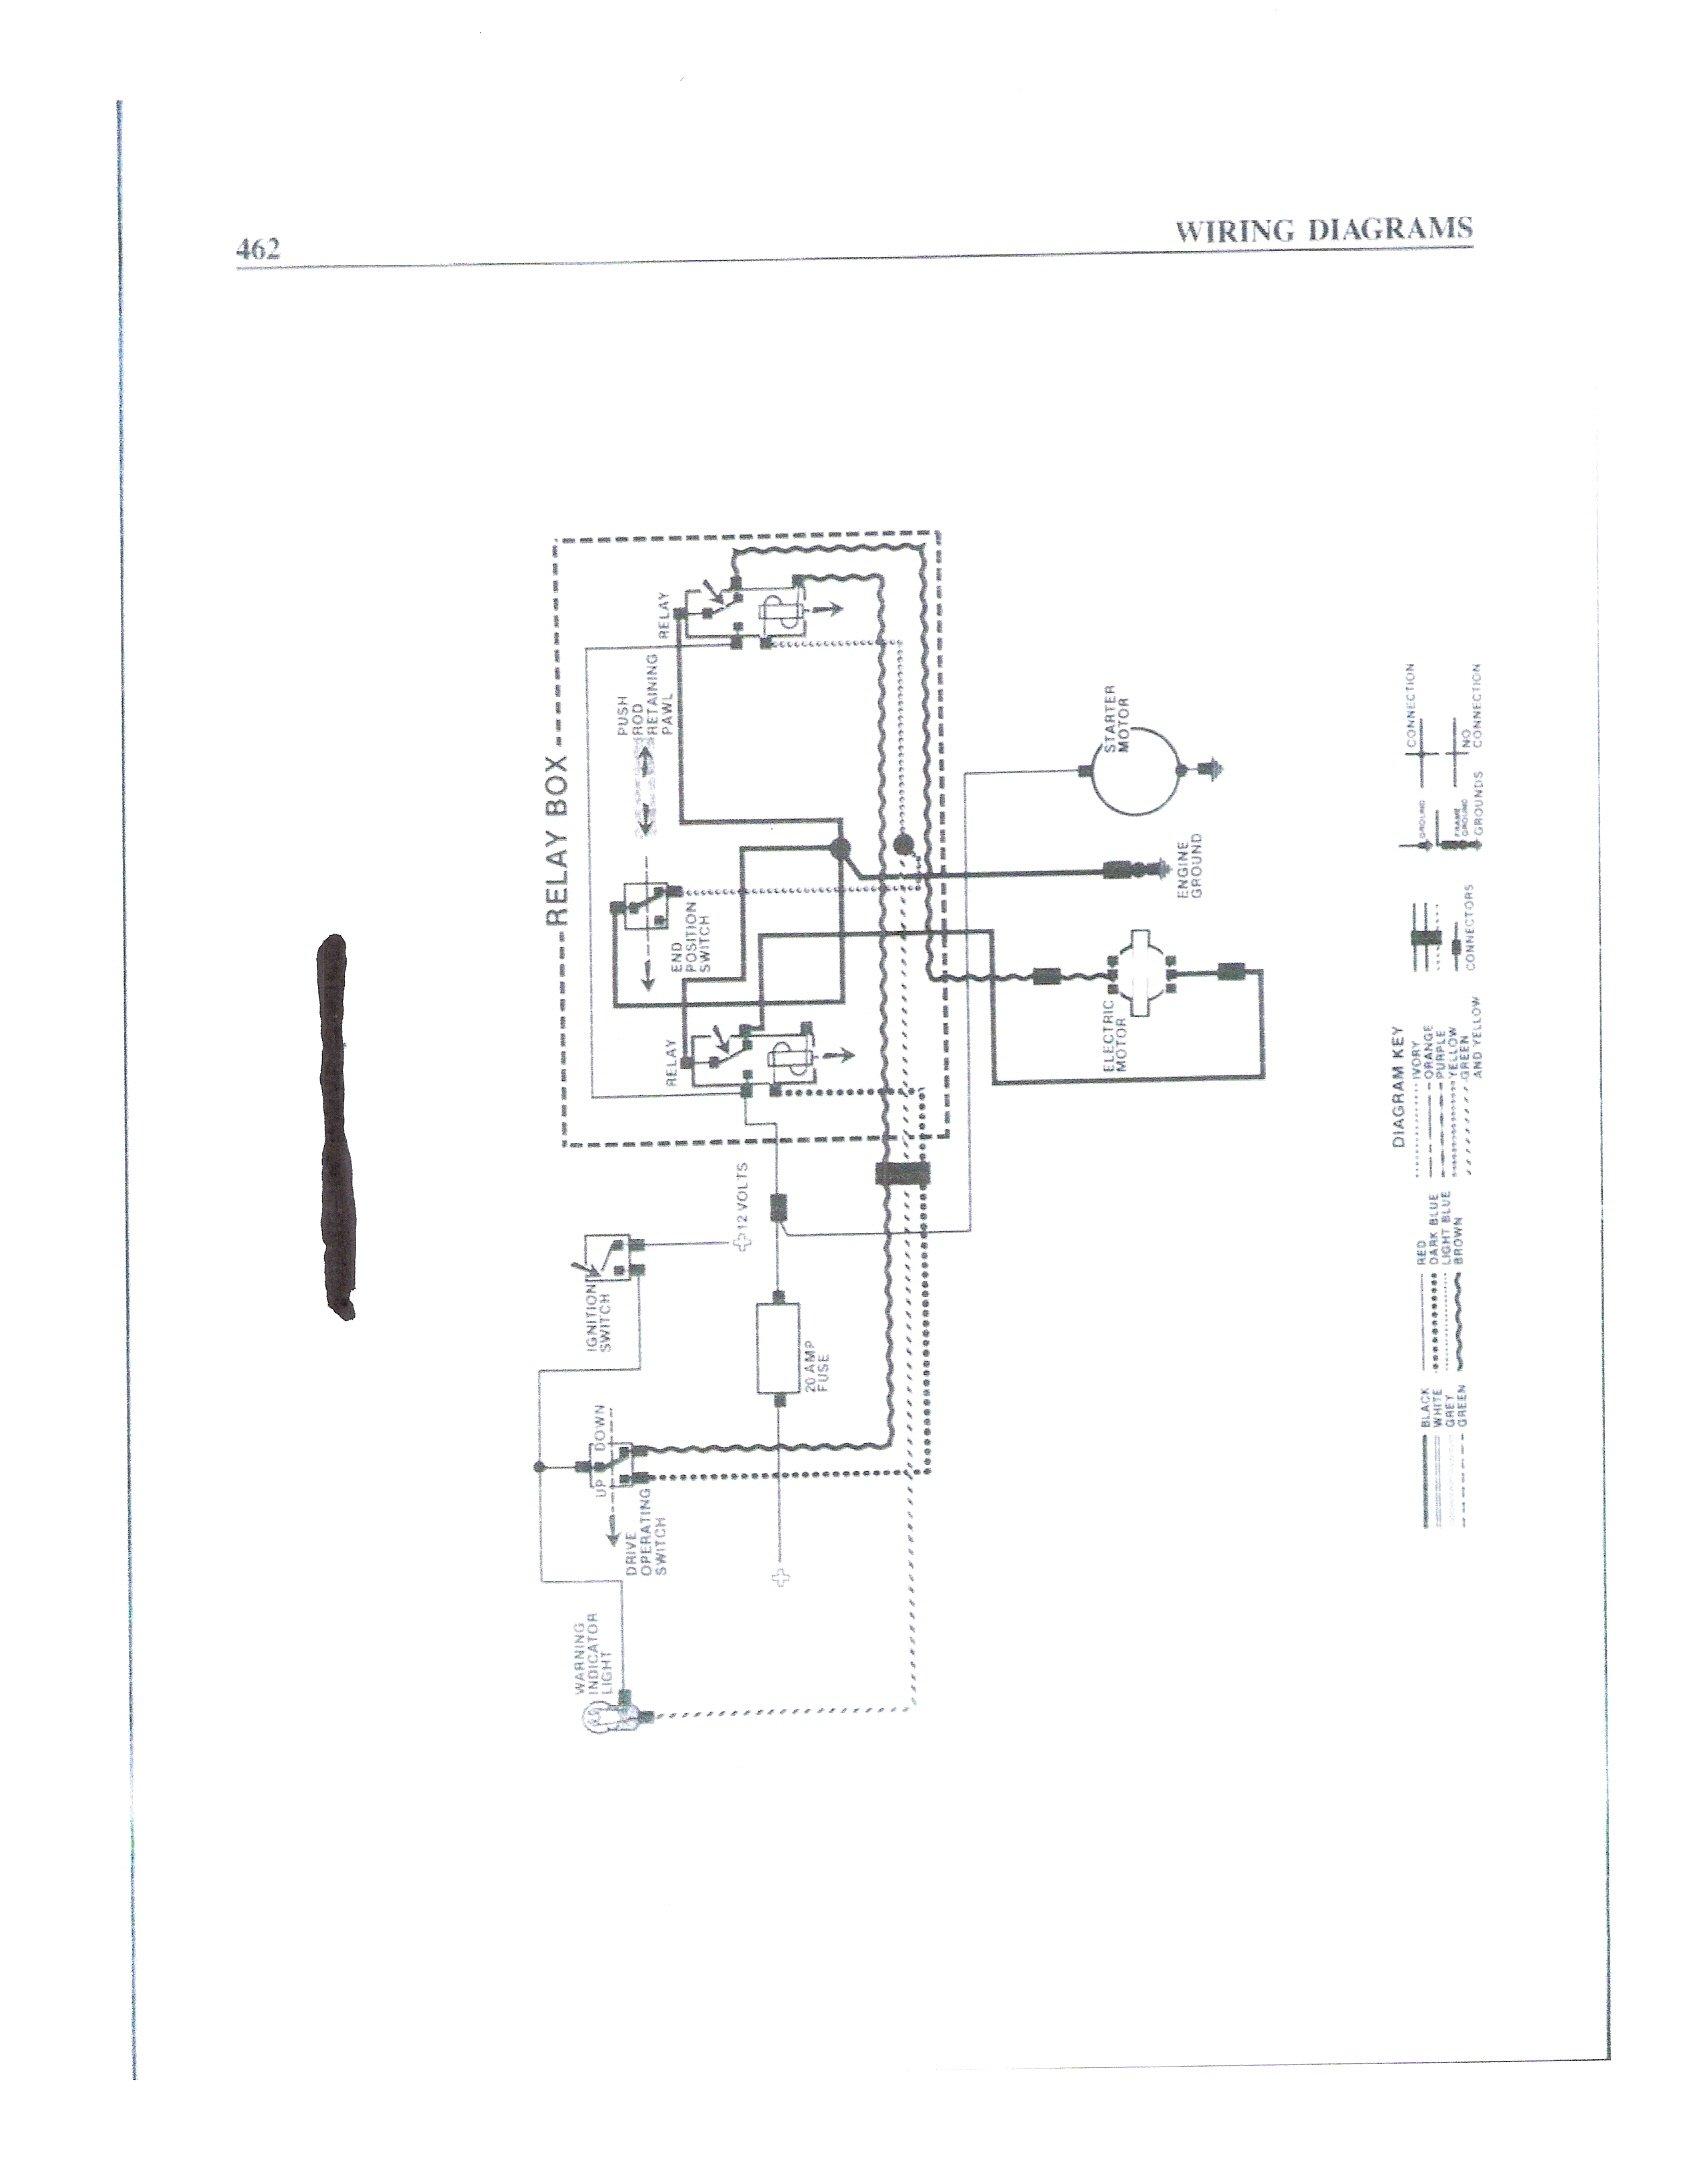 Diagram Ford Capri Workshop Wiring Diagram Full Version Hd Quality Wiring Diagram Sitexpitts Filmarco It